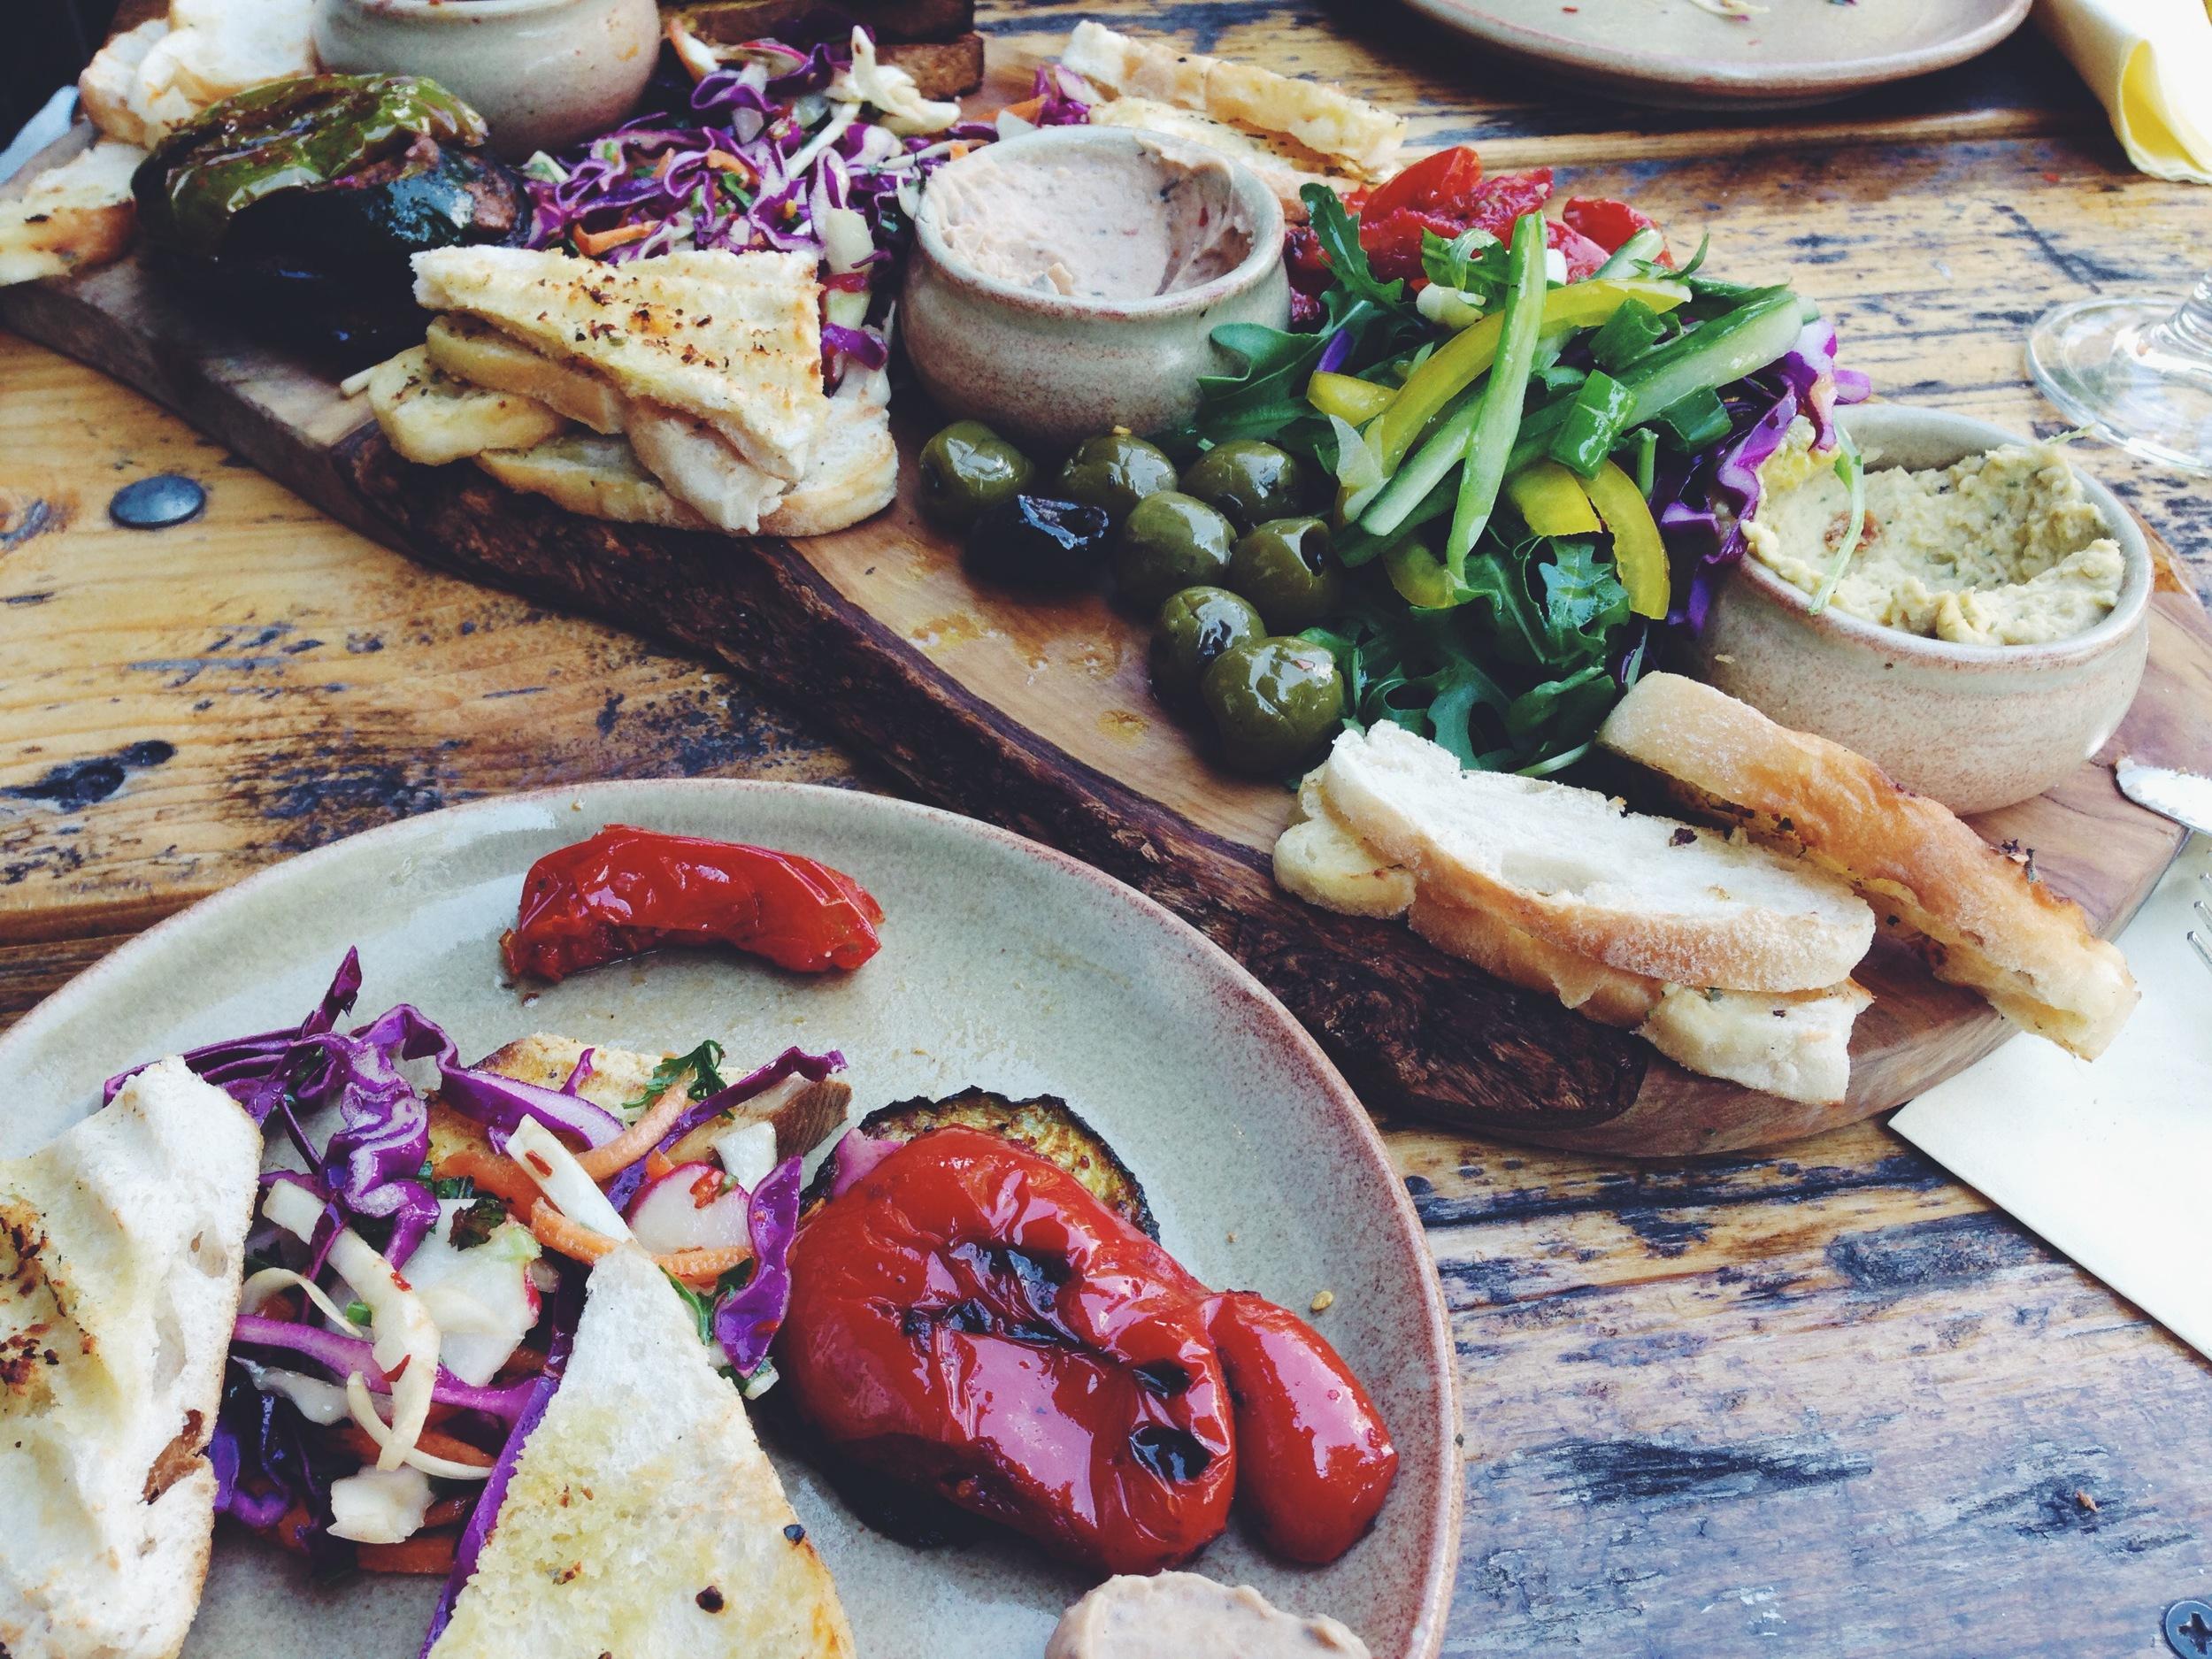 The vegan platter at The Font, Chorlton